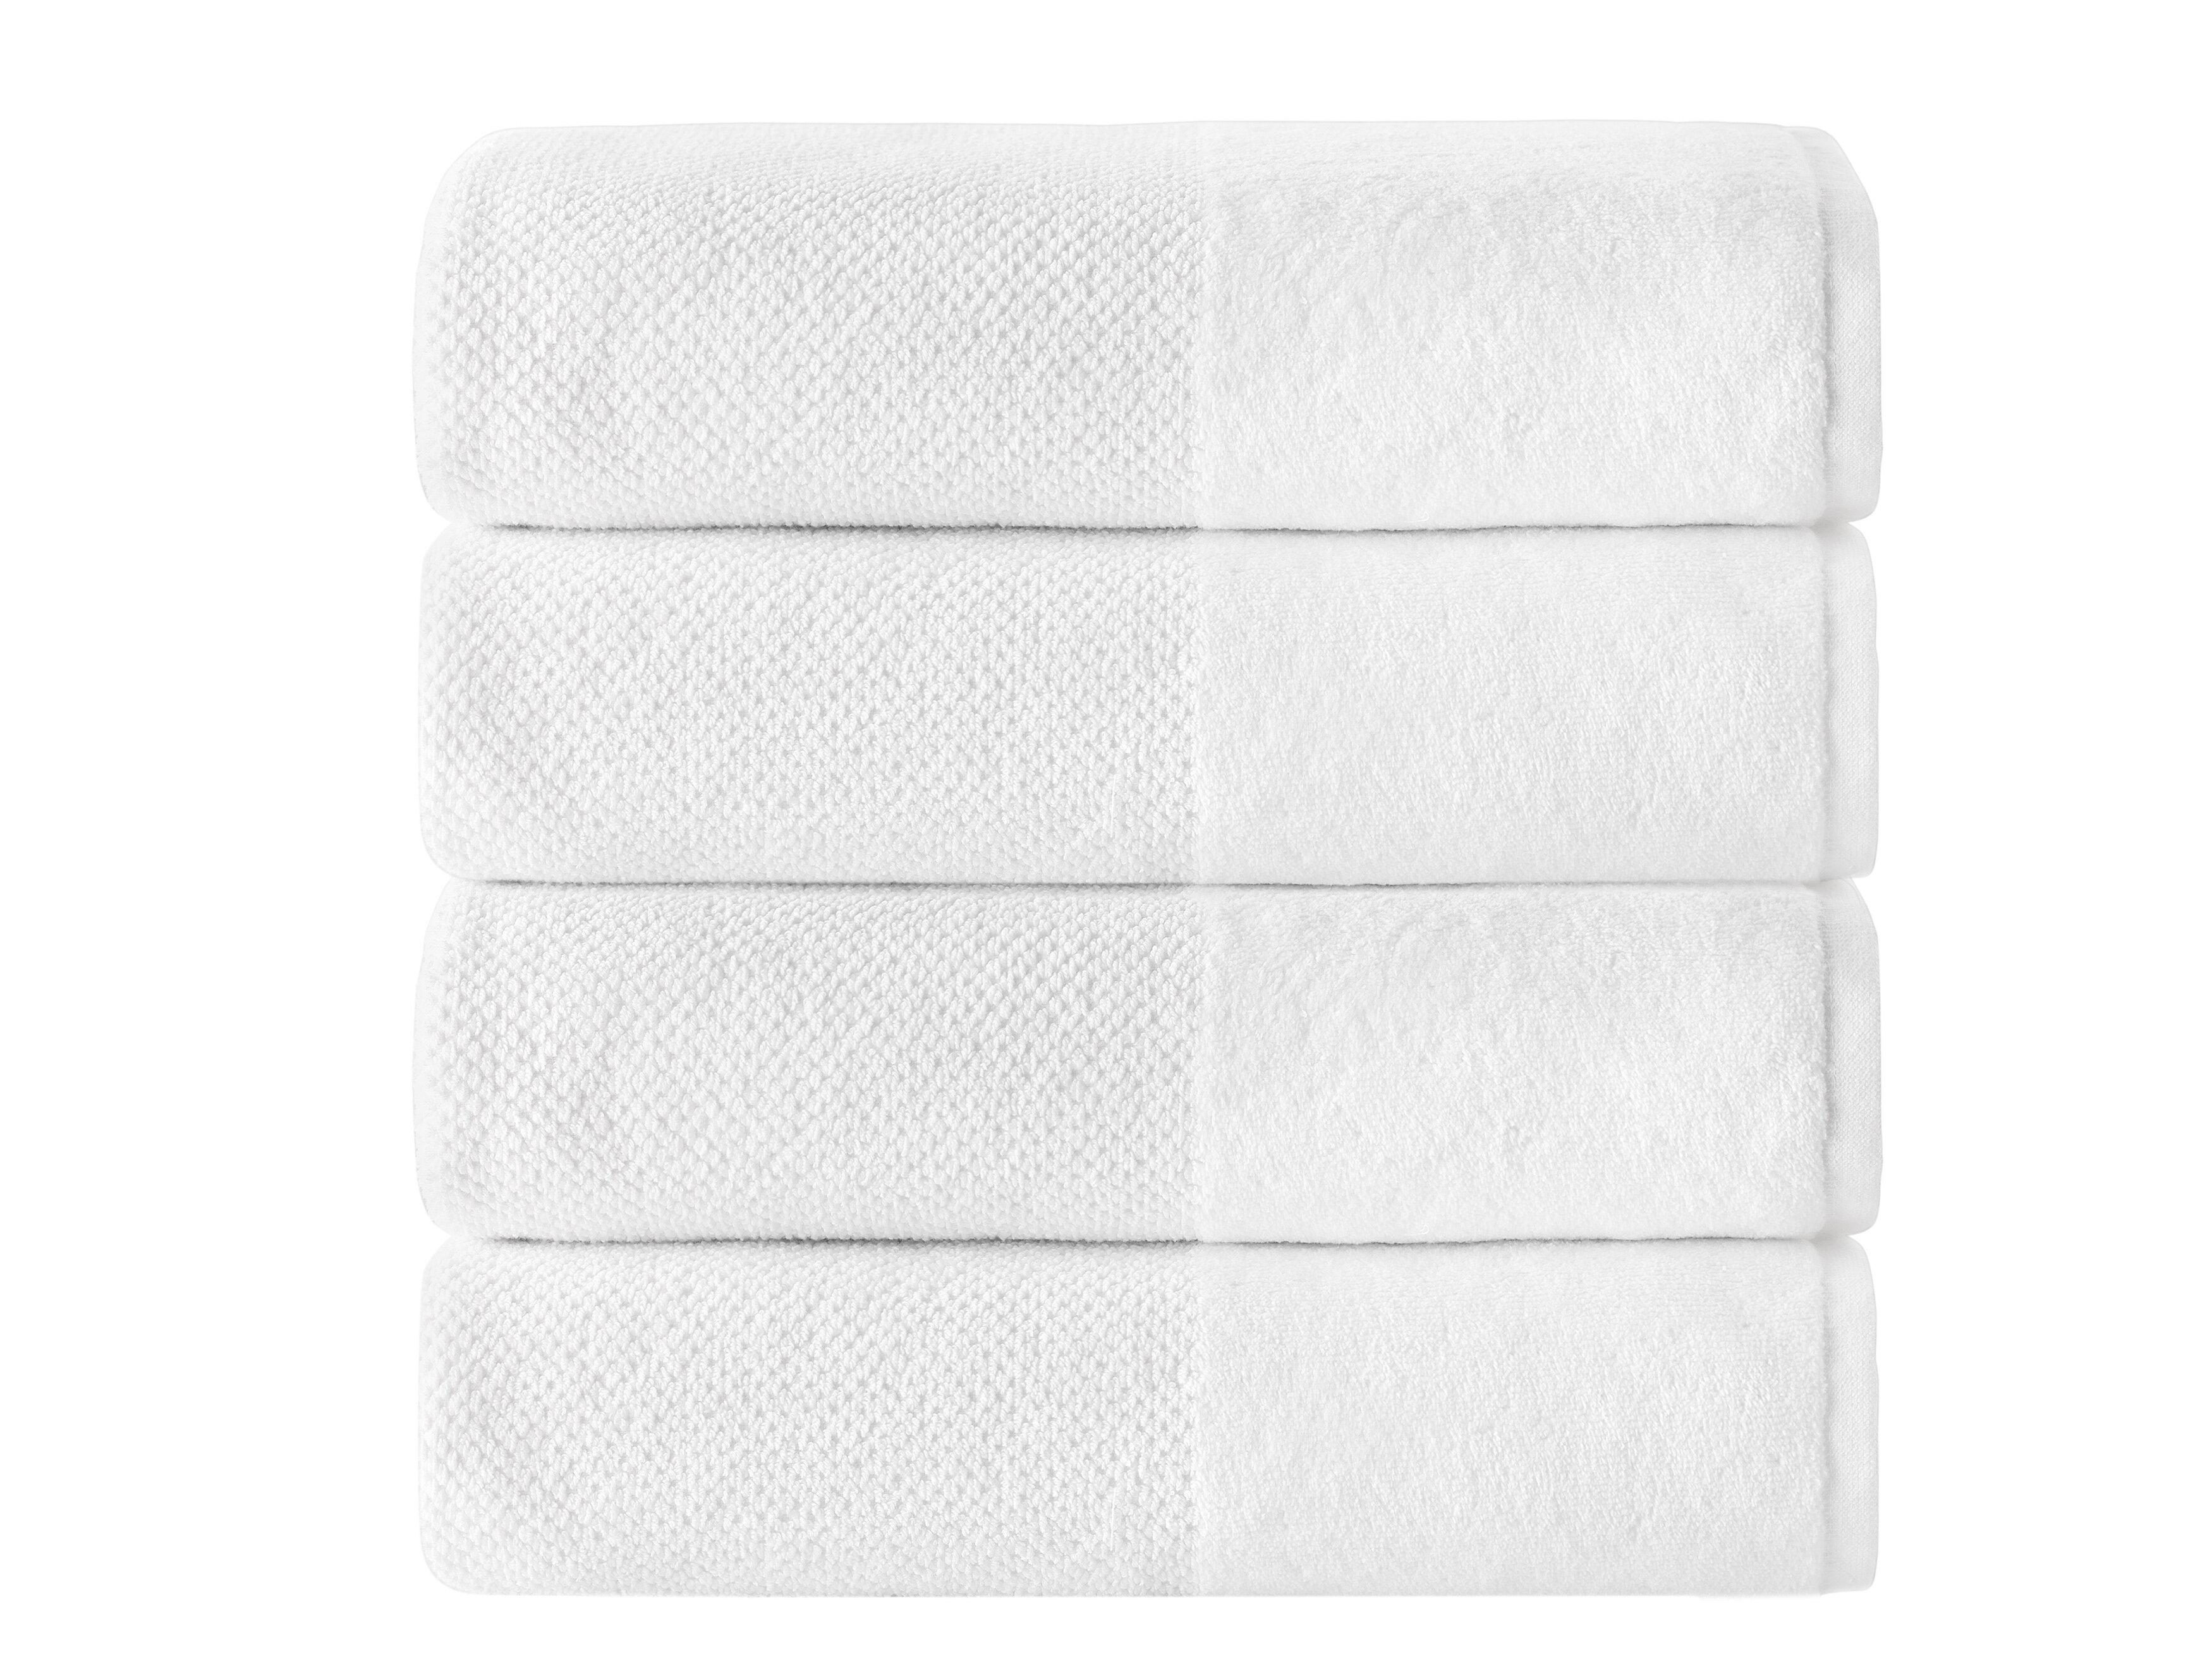 Sheela 4 Piece 100 Cotton Bath Towel Set Reviews Joss Main